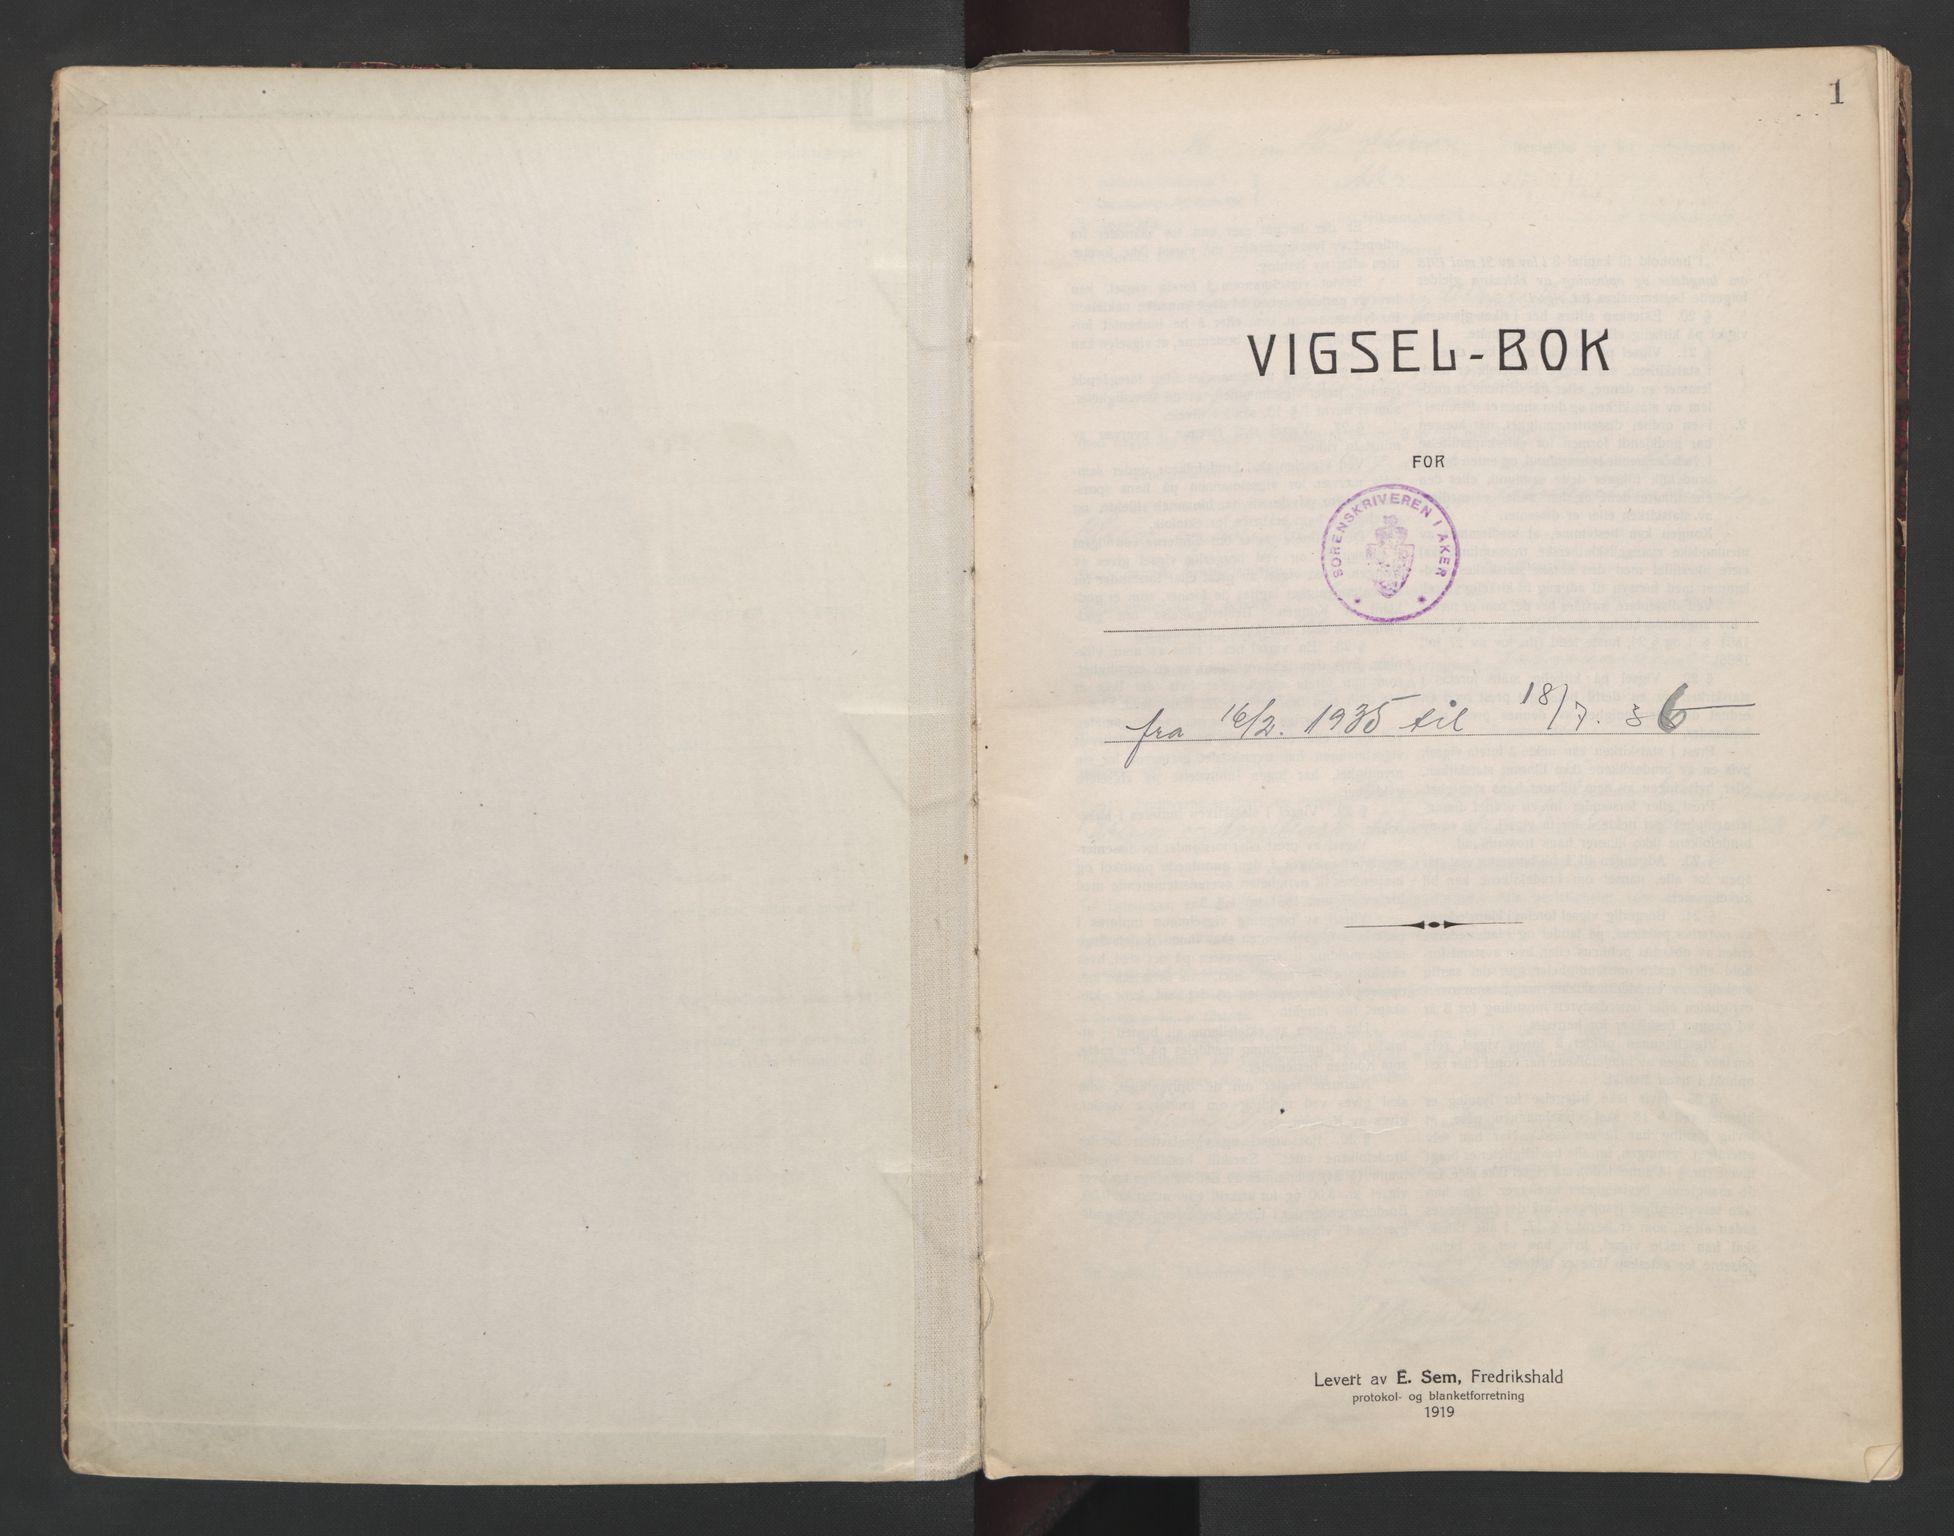 SAO, Aker sorenskriveri, L/Lc/Lcb/L0008: Vigselprotokoll, 1935-1936, s. 1